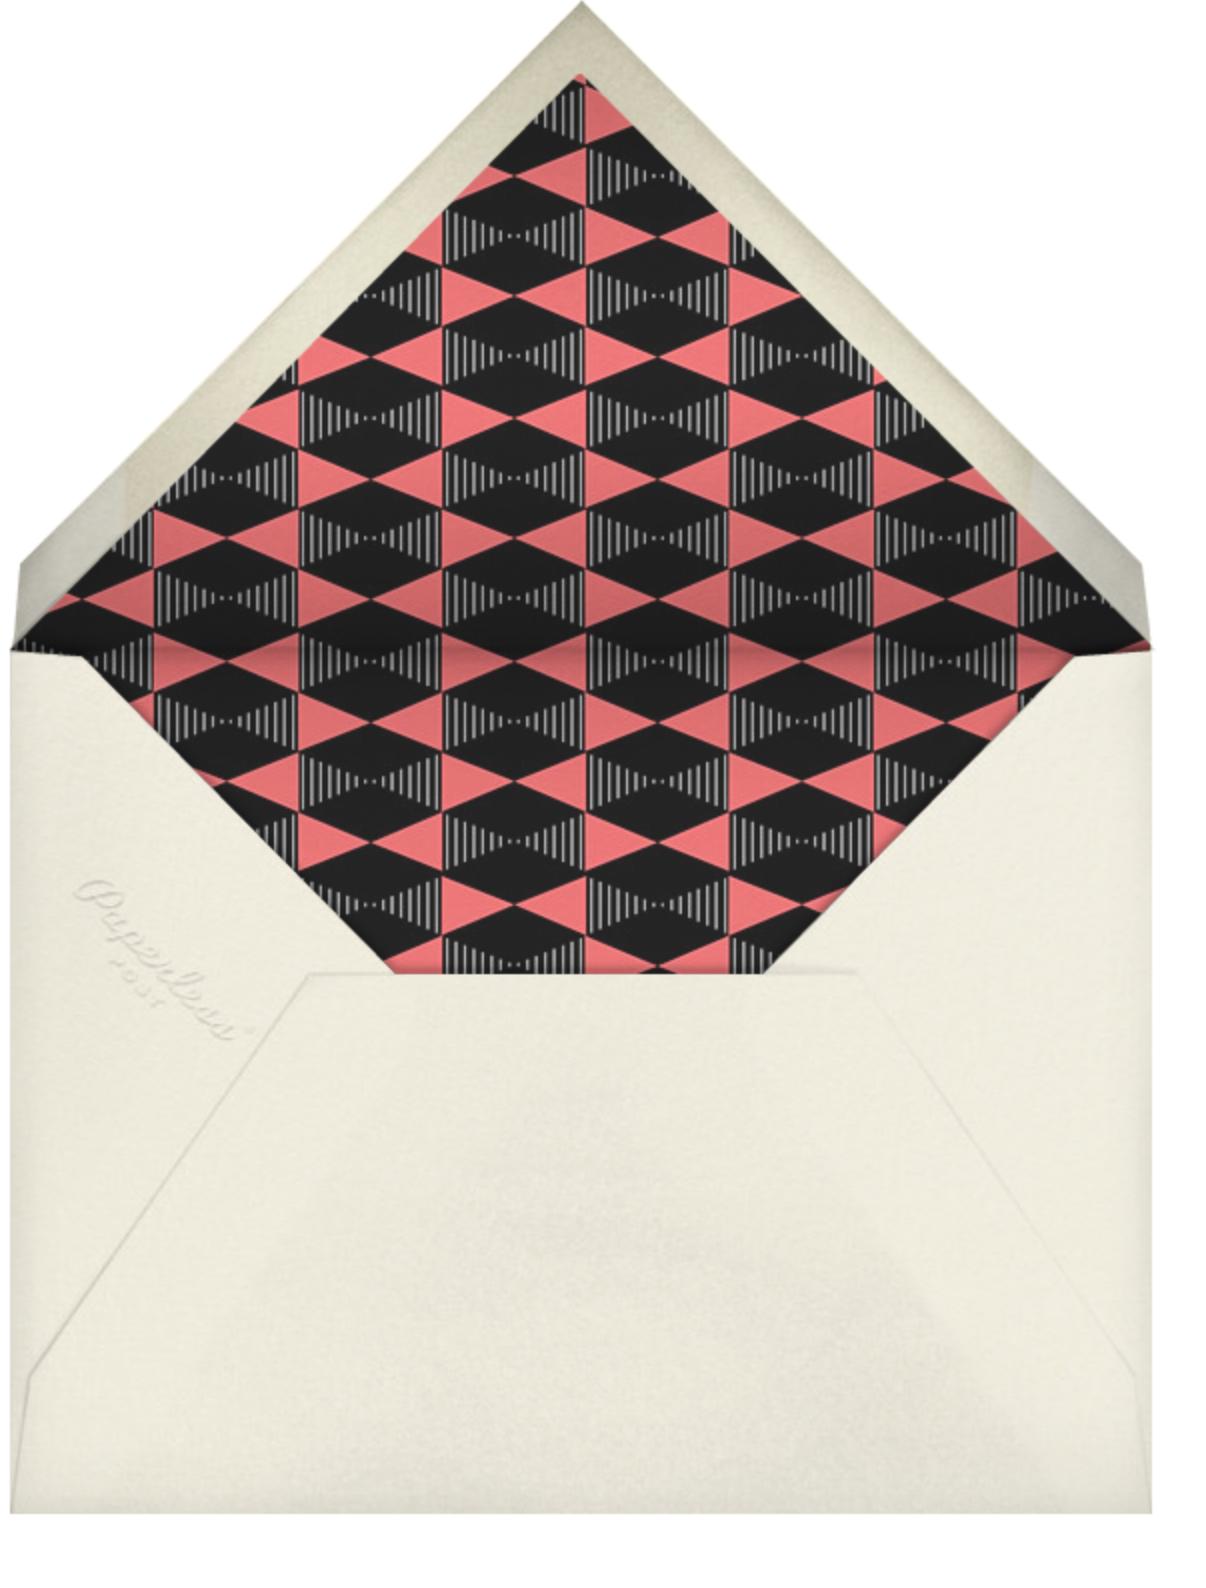 Plaza Square - Coral - Paperless Post - Housewarming - envelope back